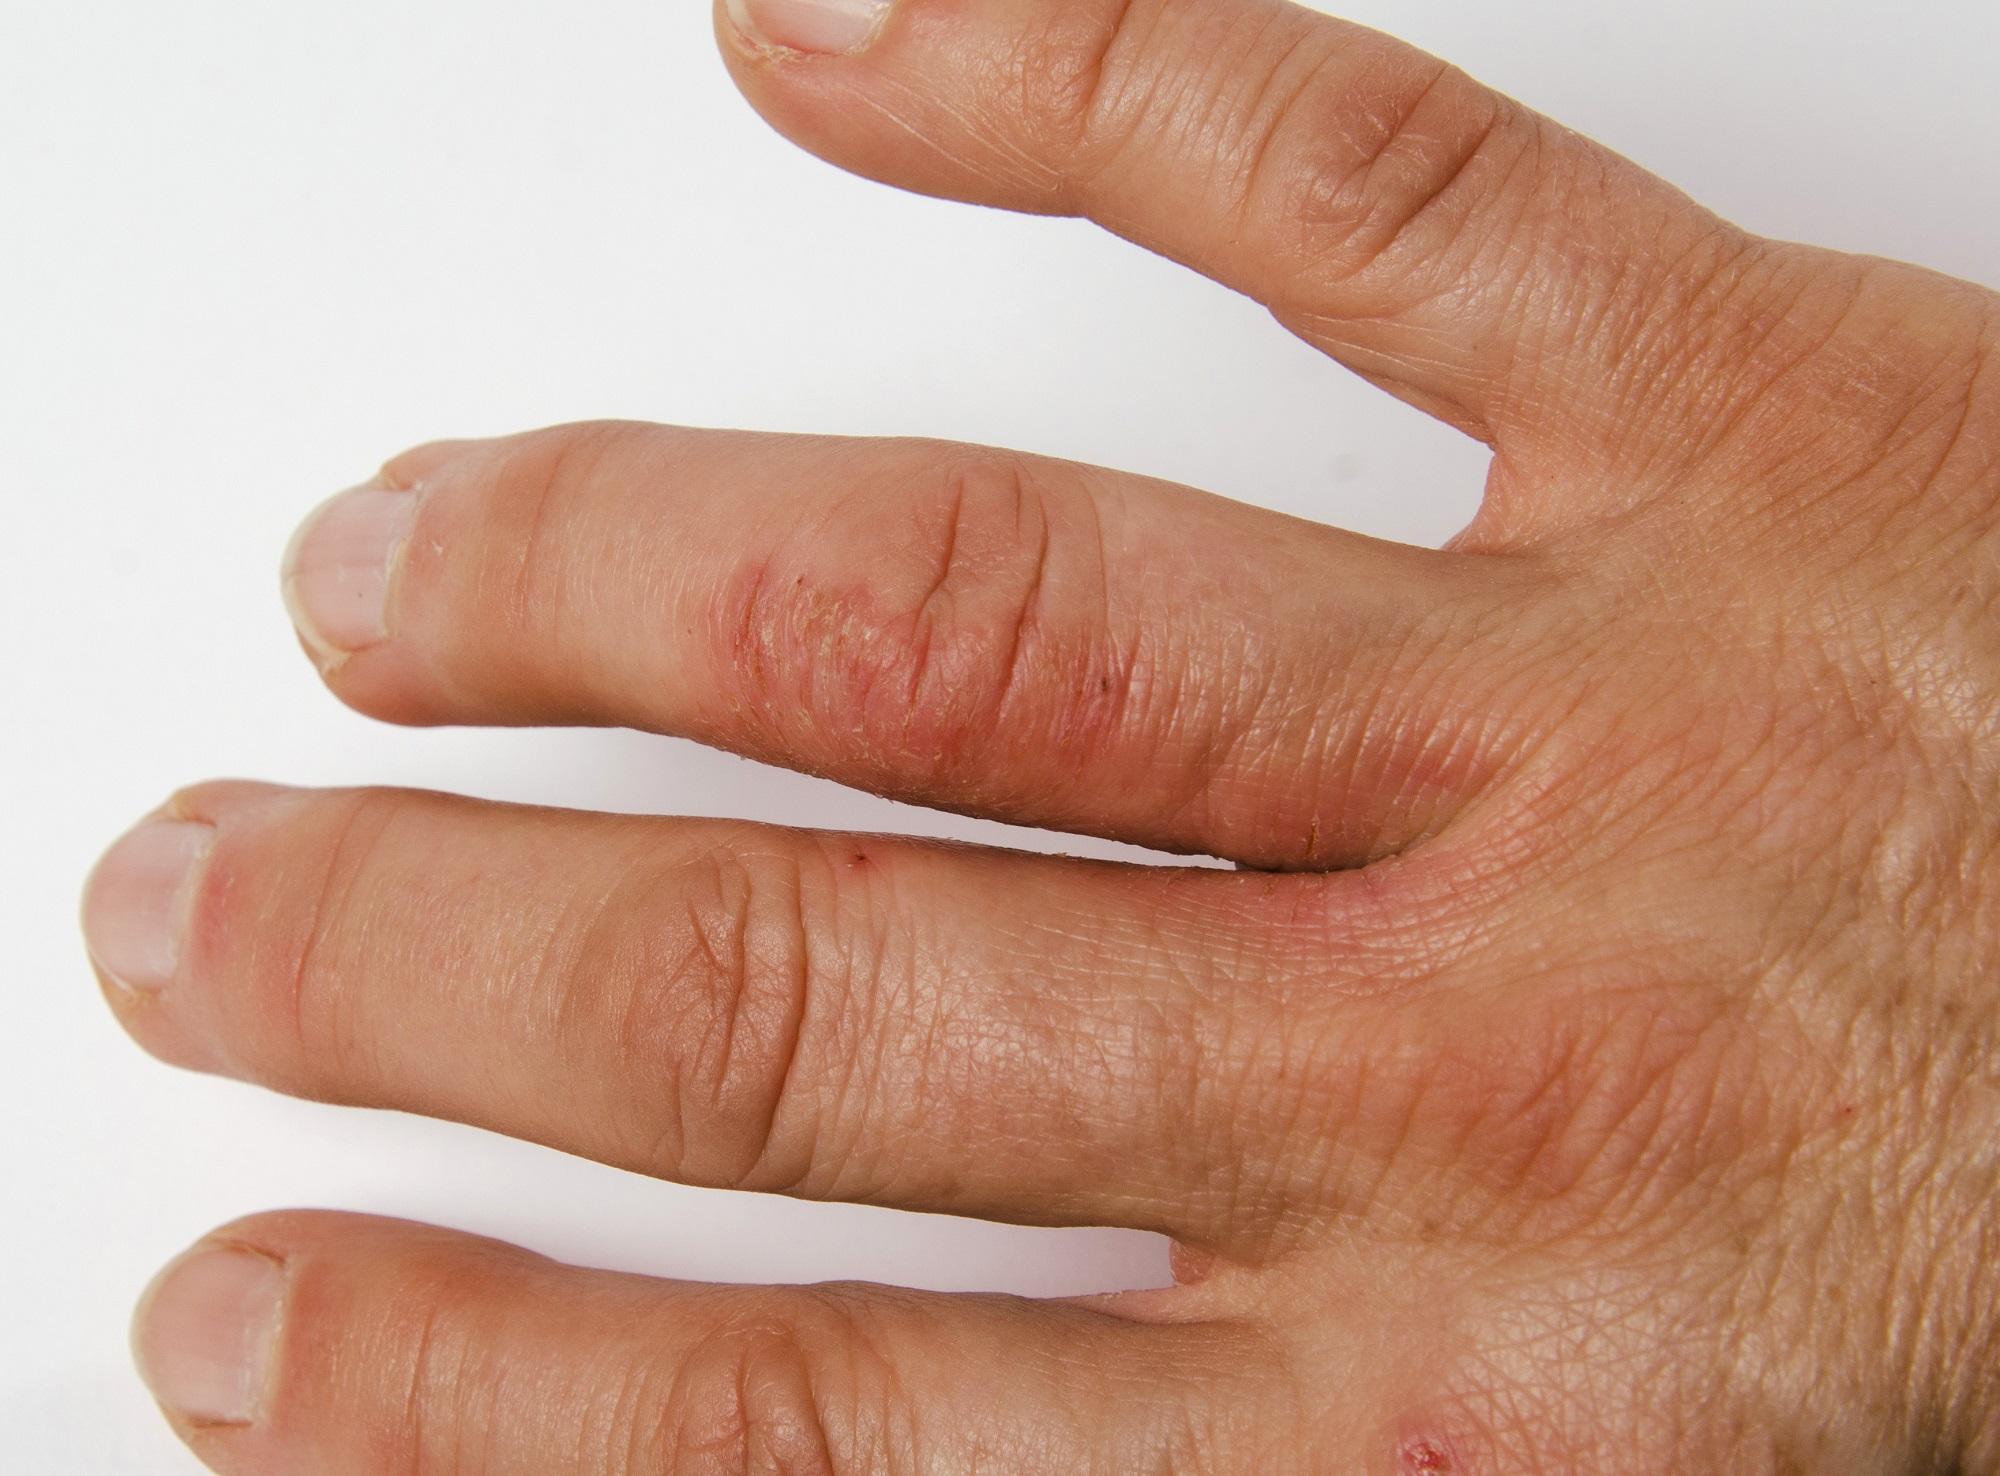 Filgotinib Effective For Treatment Of Active Psoriatic Arthritis Rheumatology Advisor